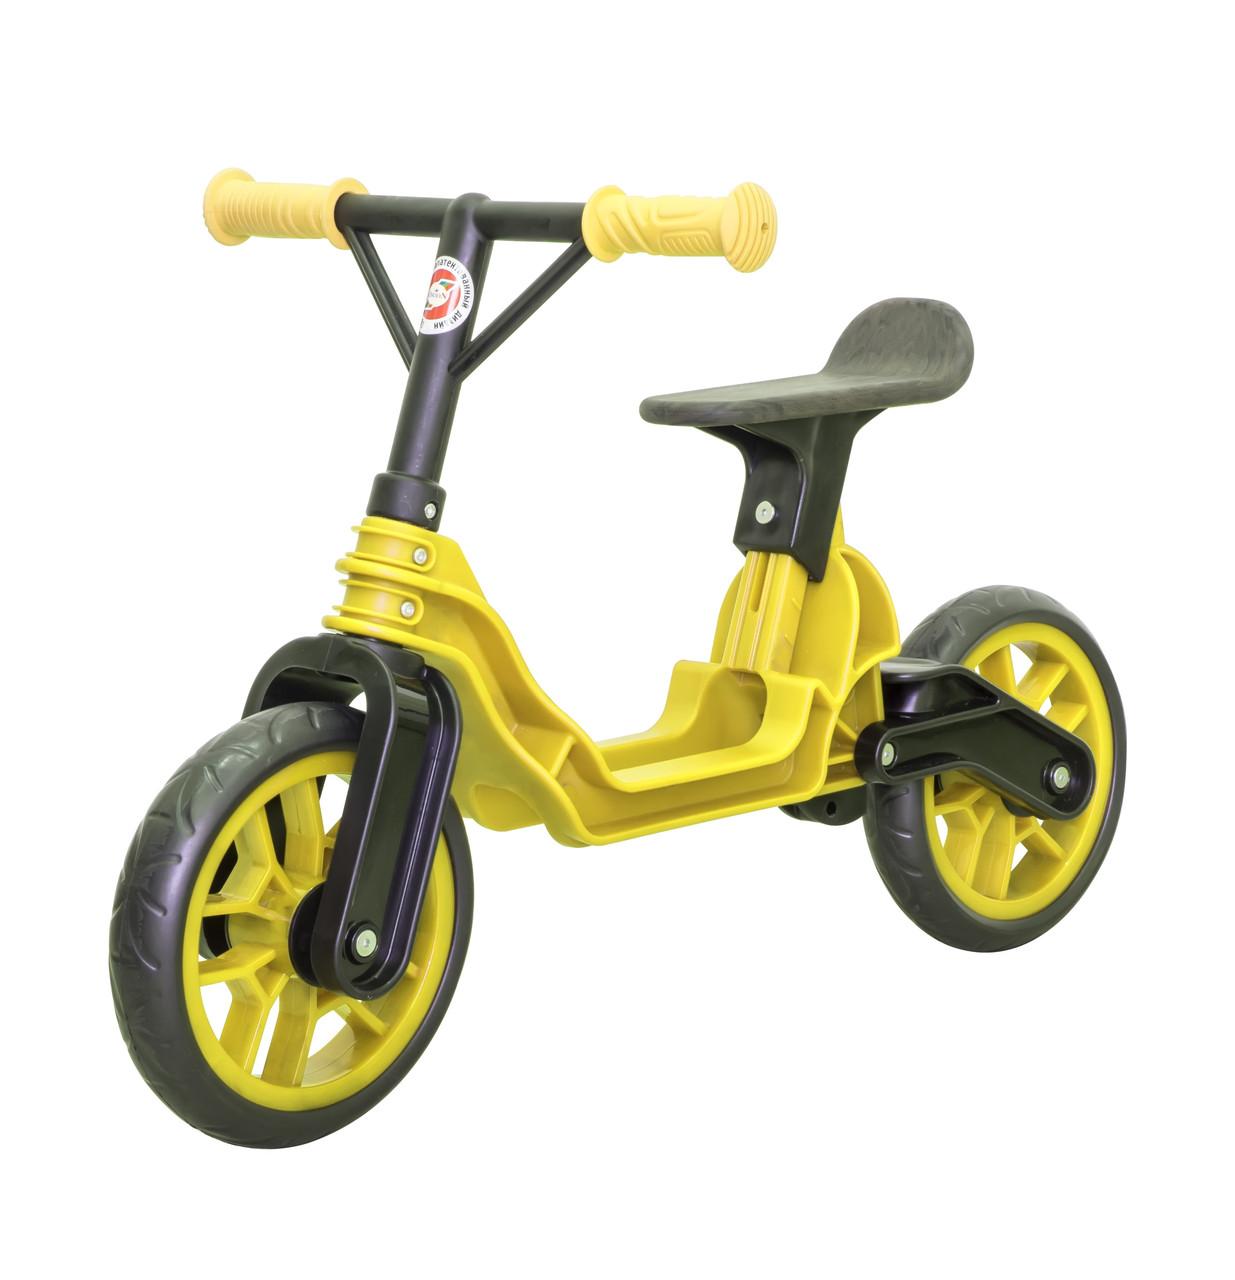 Мотоцикл 2-х колёсный Байк беговел желтый